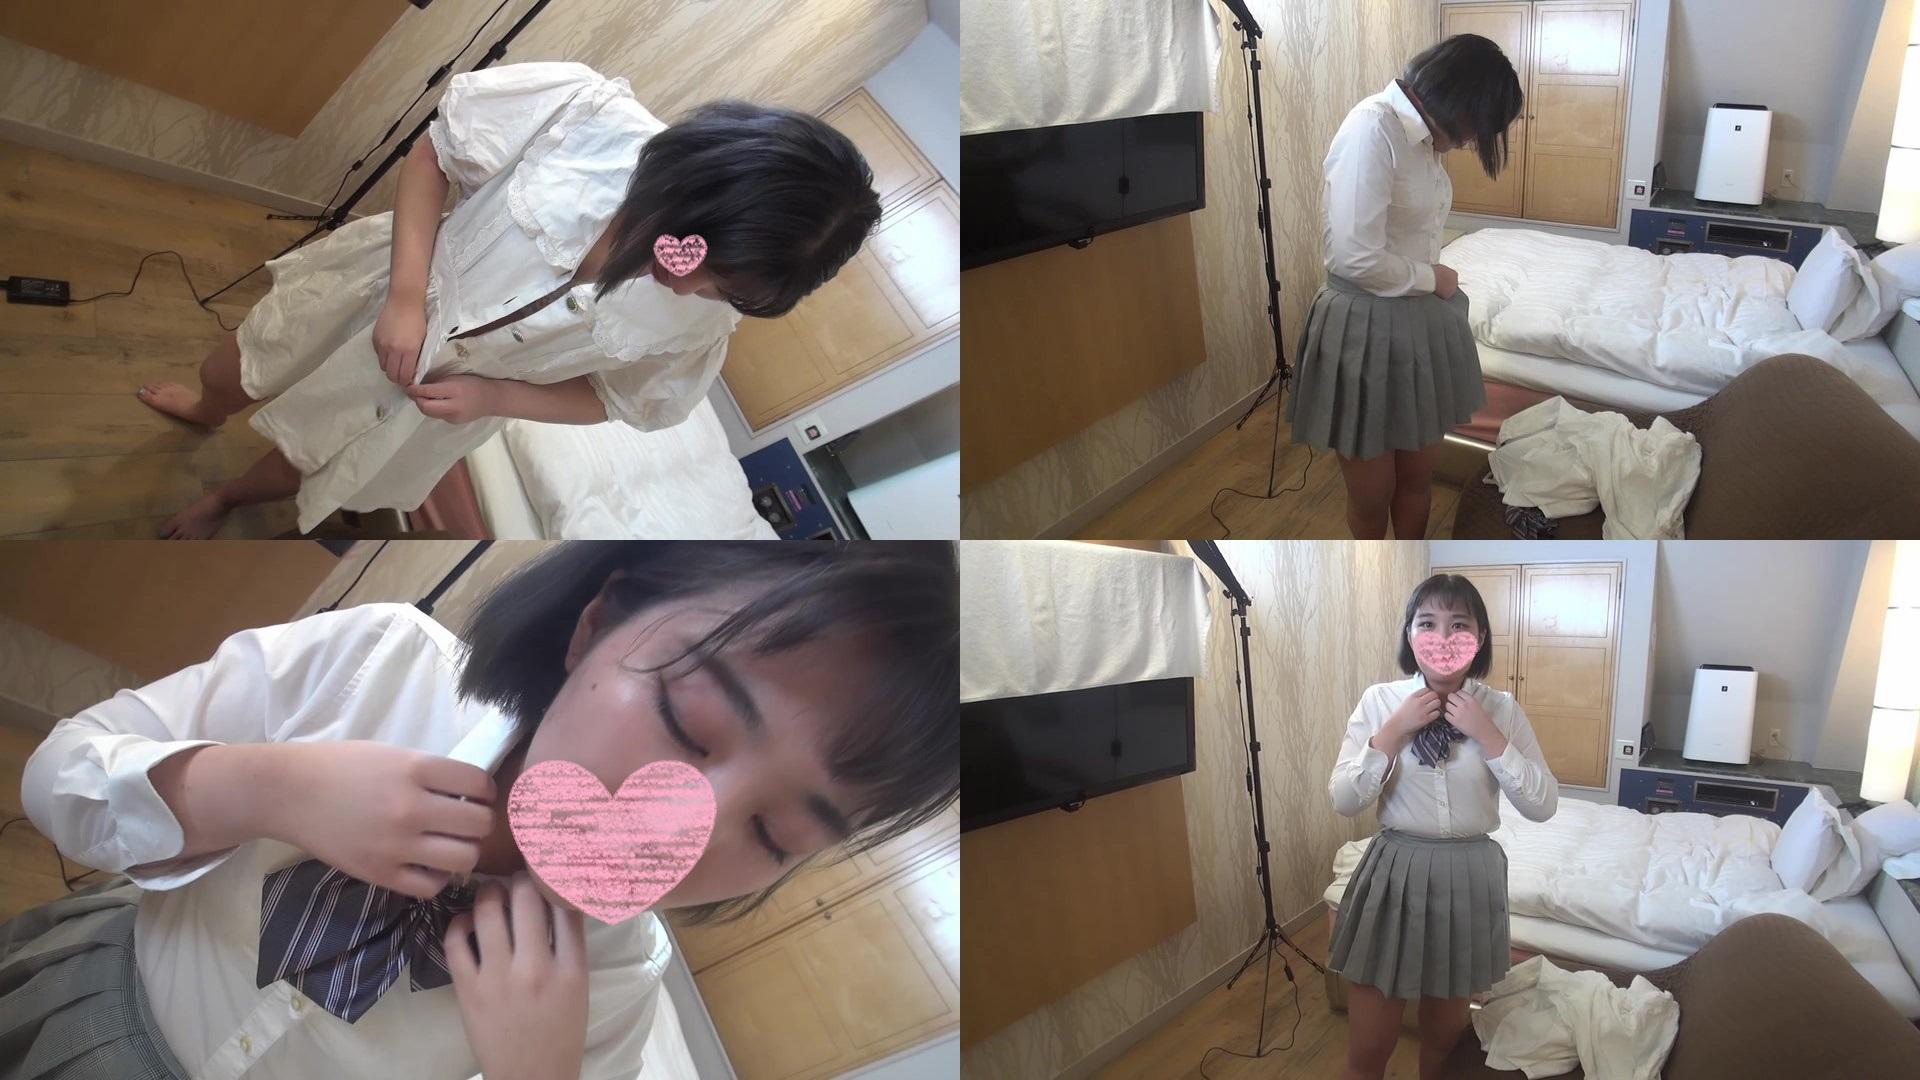 FC2 PPV 1463564 Life's first 3P ❤ Ubu Ubu daughter ❤️ Unprocessed pubic hair ❤️ Kitsuman Hyundaikko got a